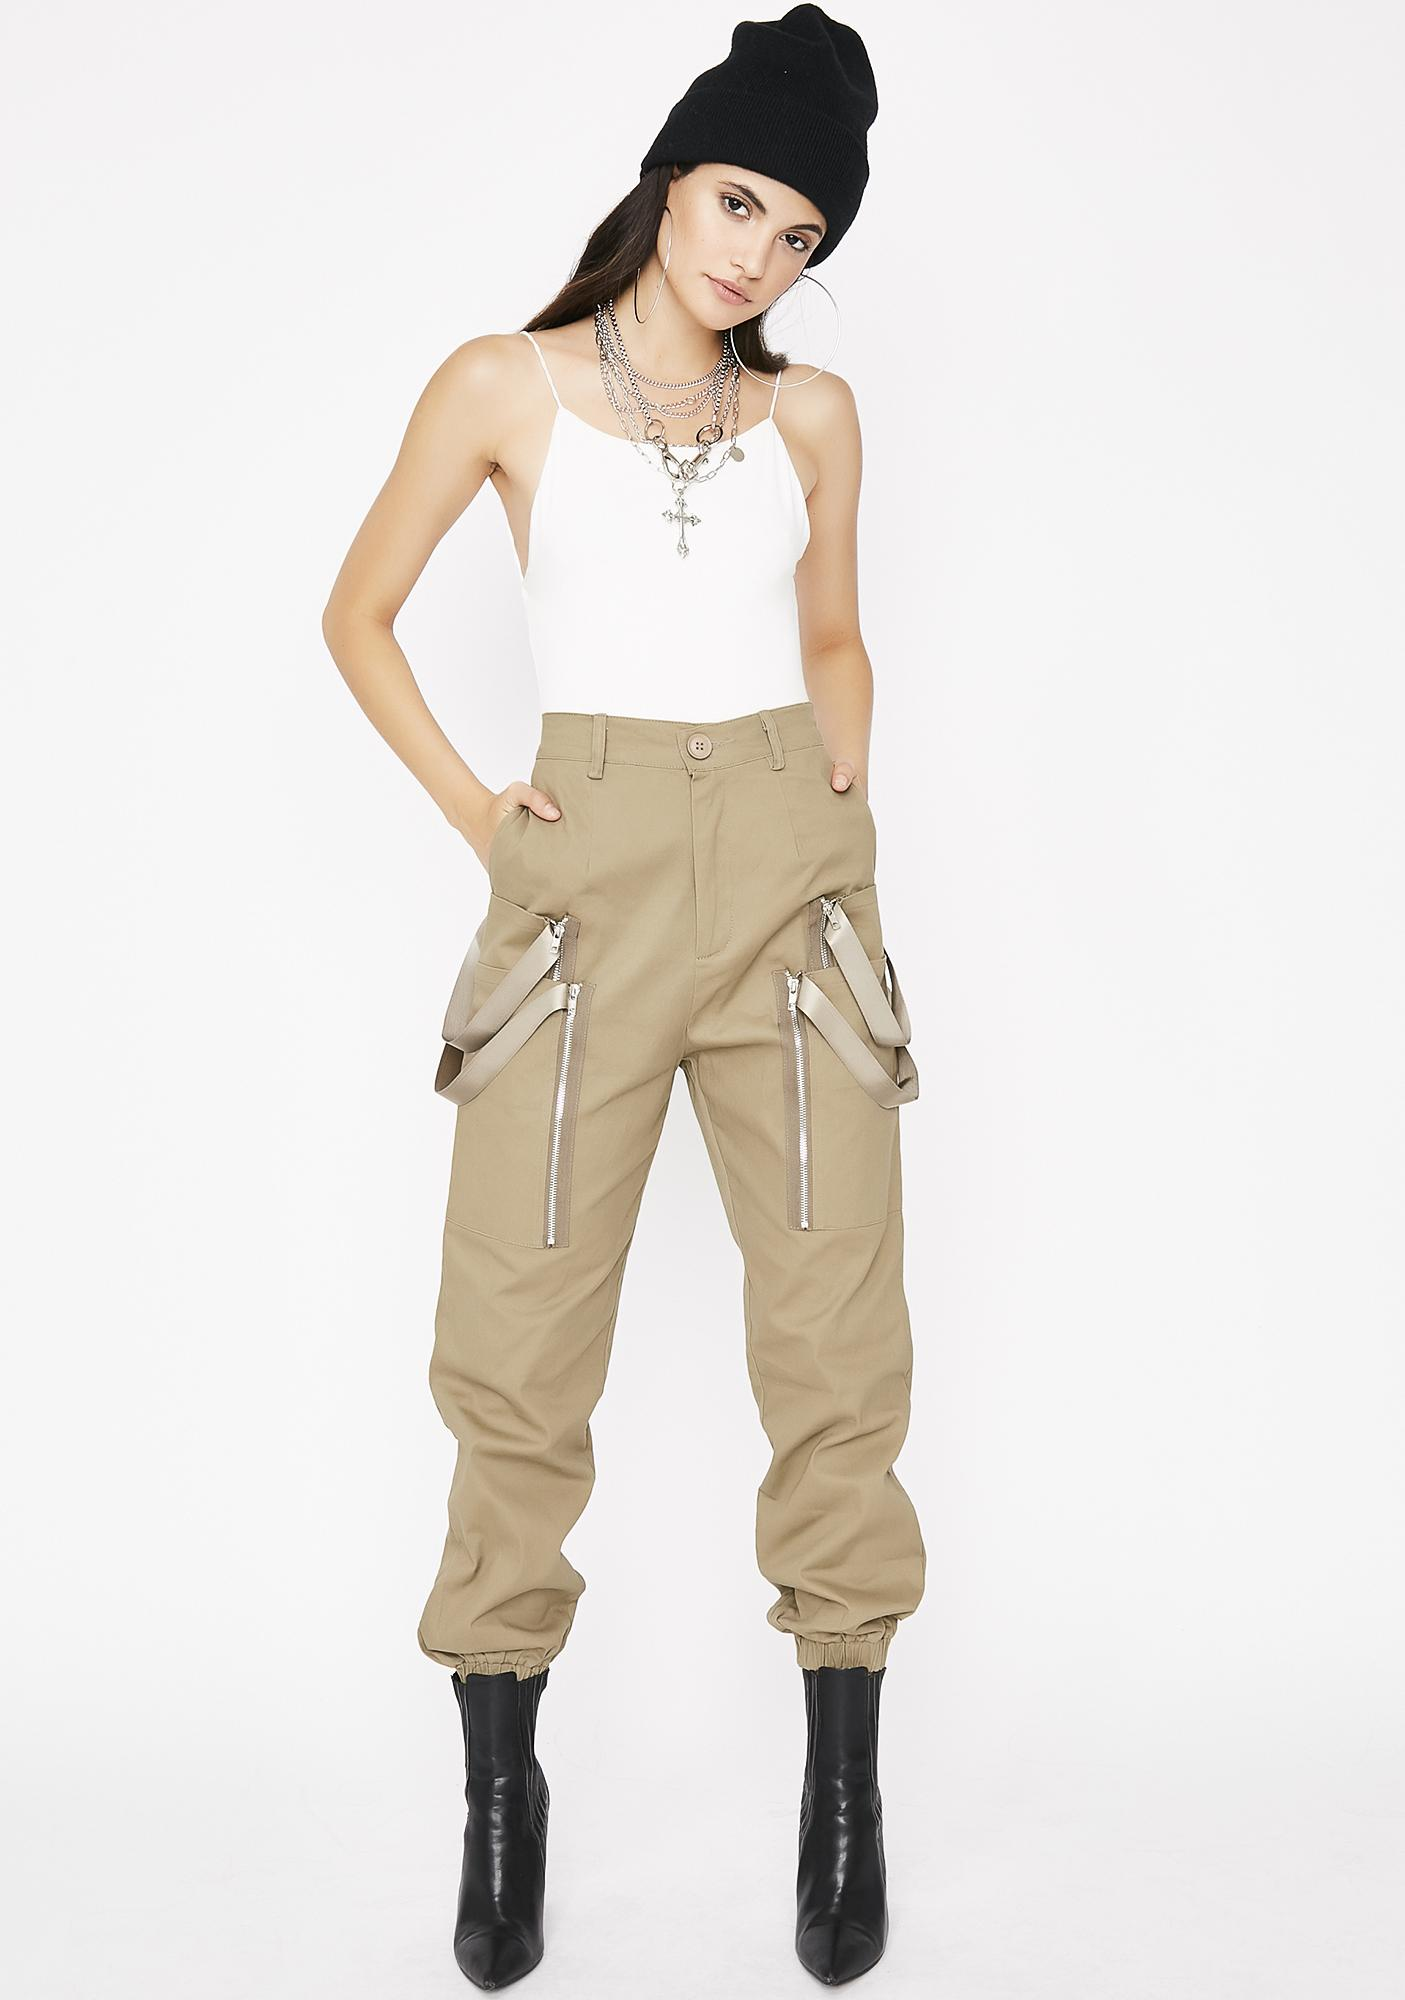 Slo Mo Backless Bodysuit